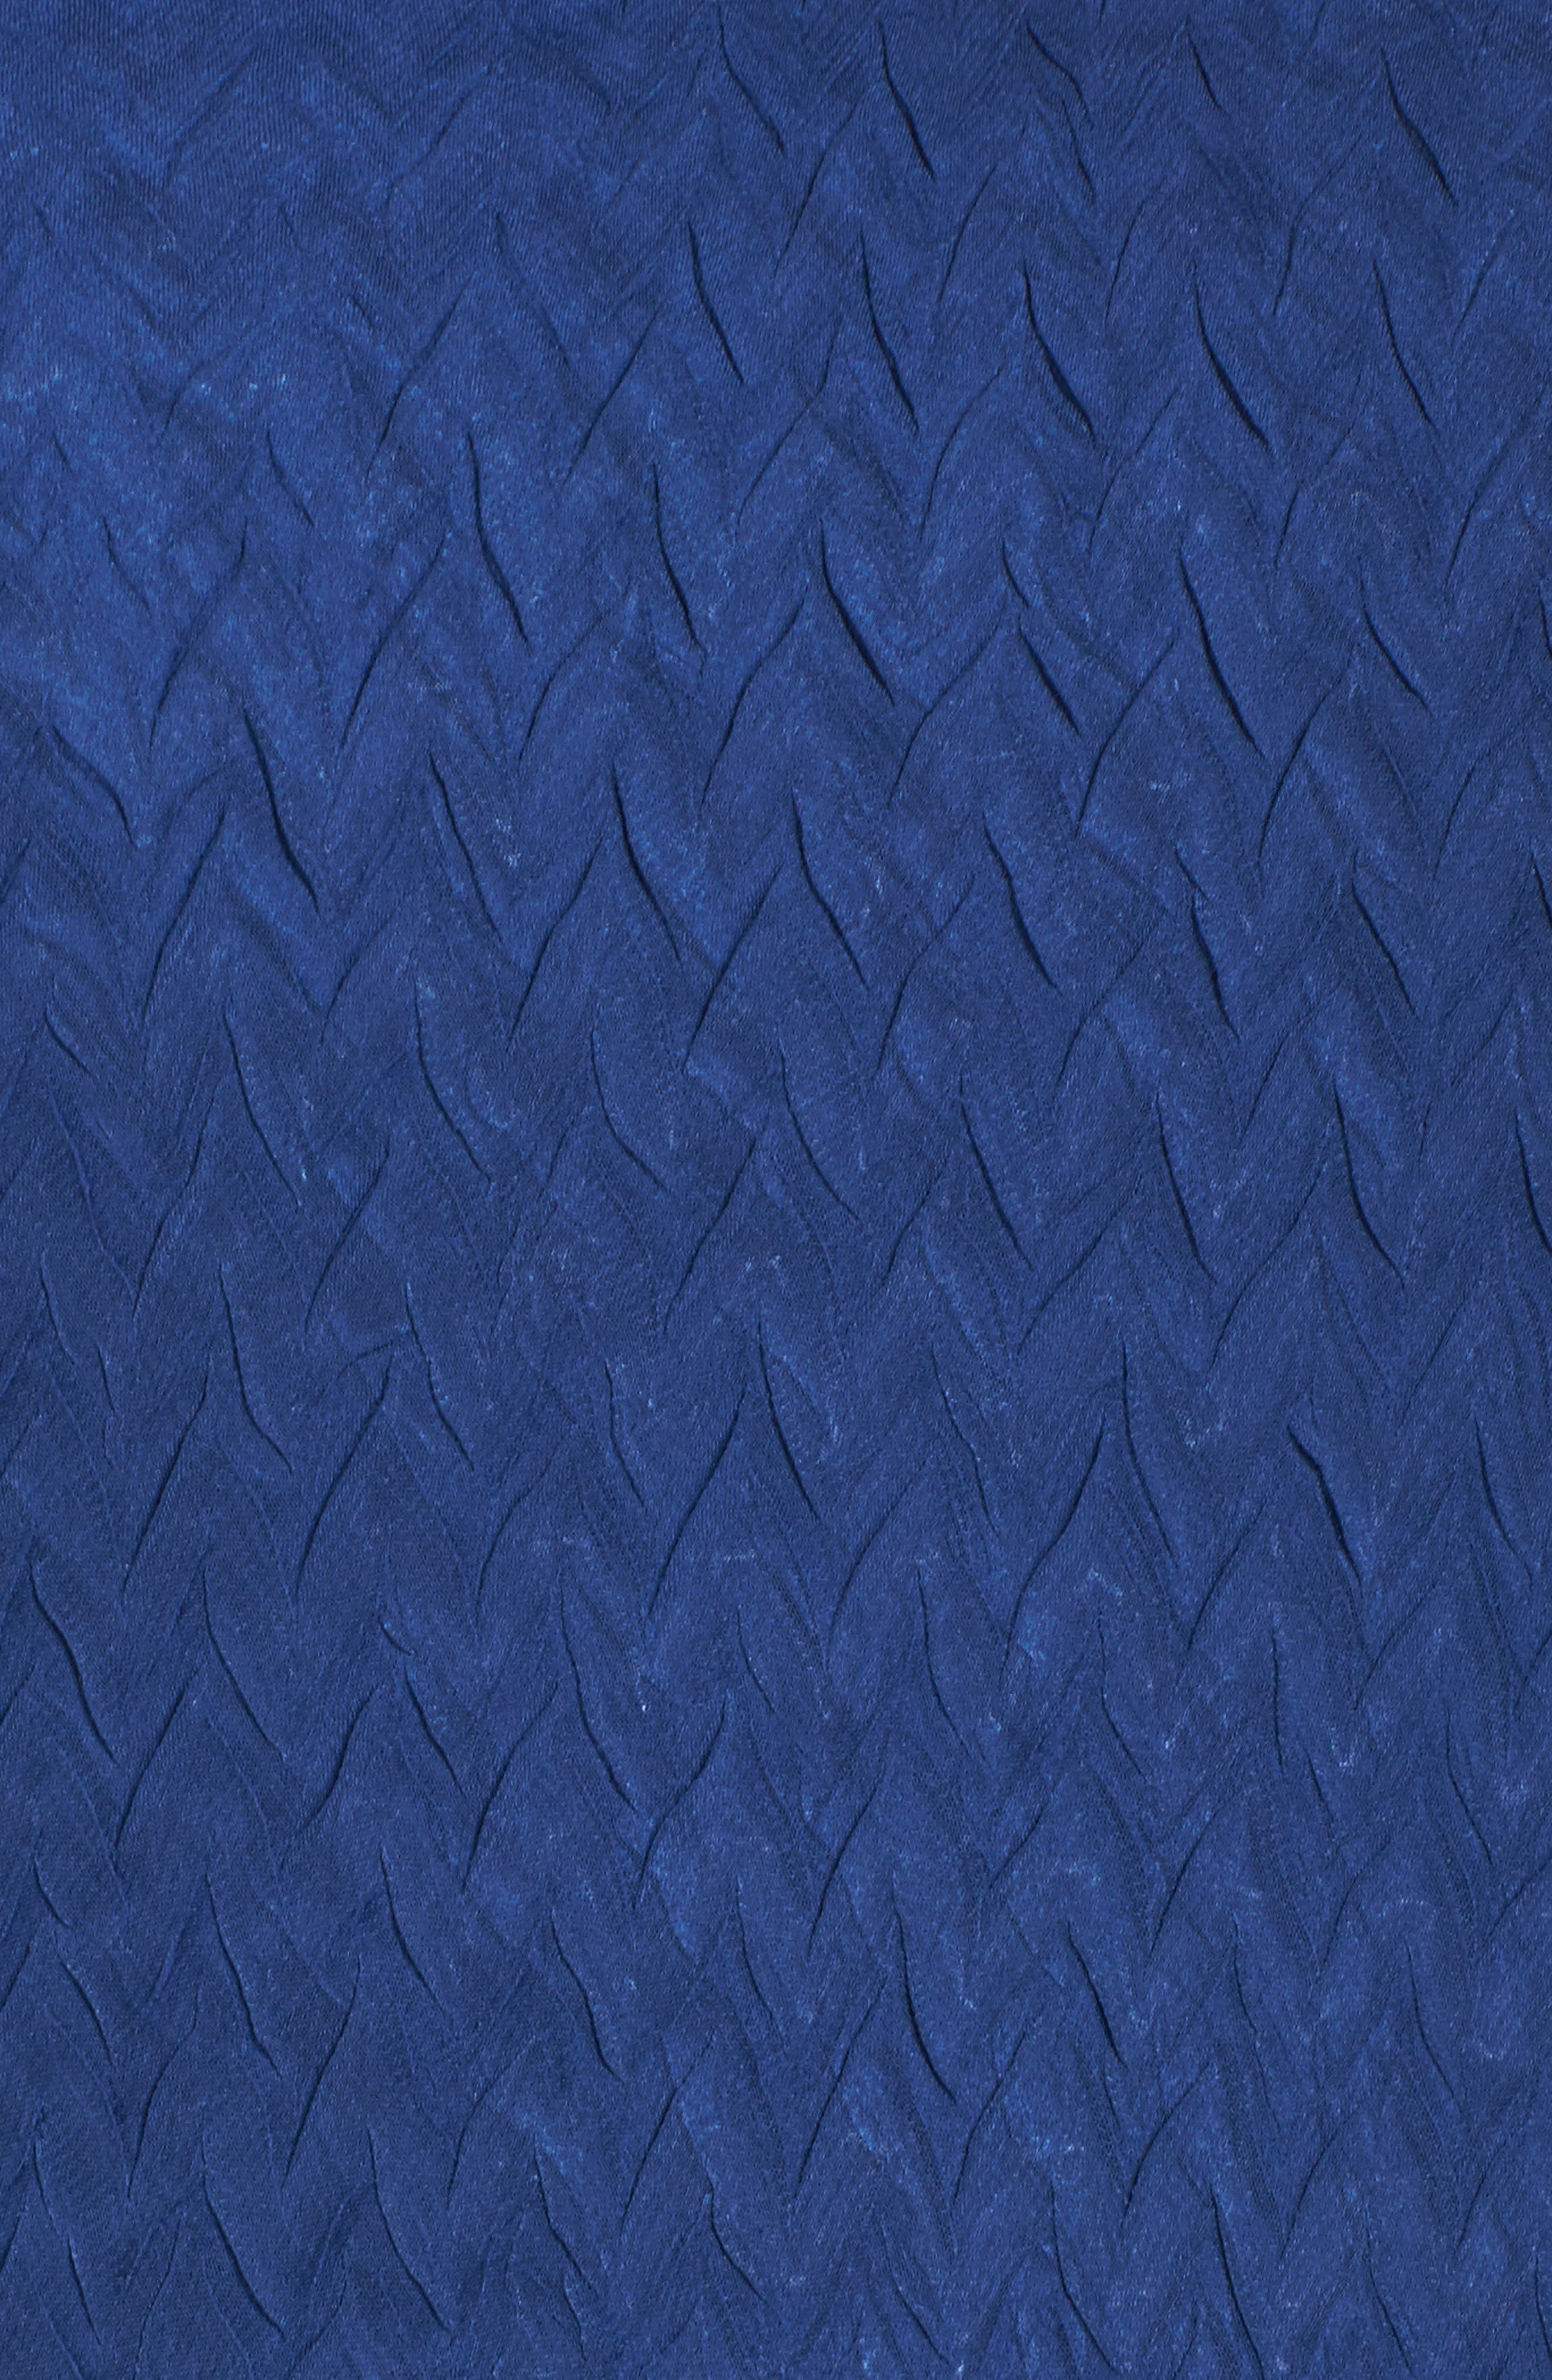 Charmeuse & Chiffon A-Line Dress,                             Alternate thumbnail 5, color,                             Navy Black Ombre